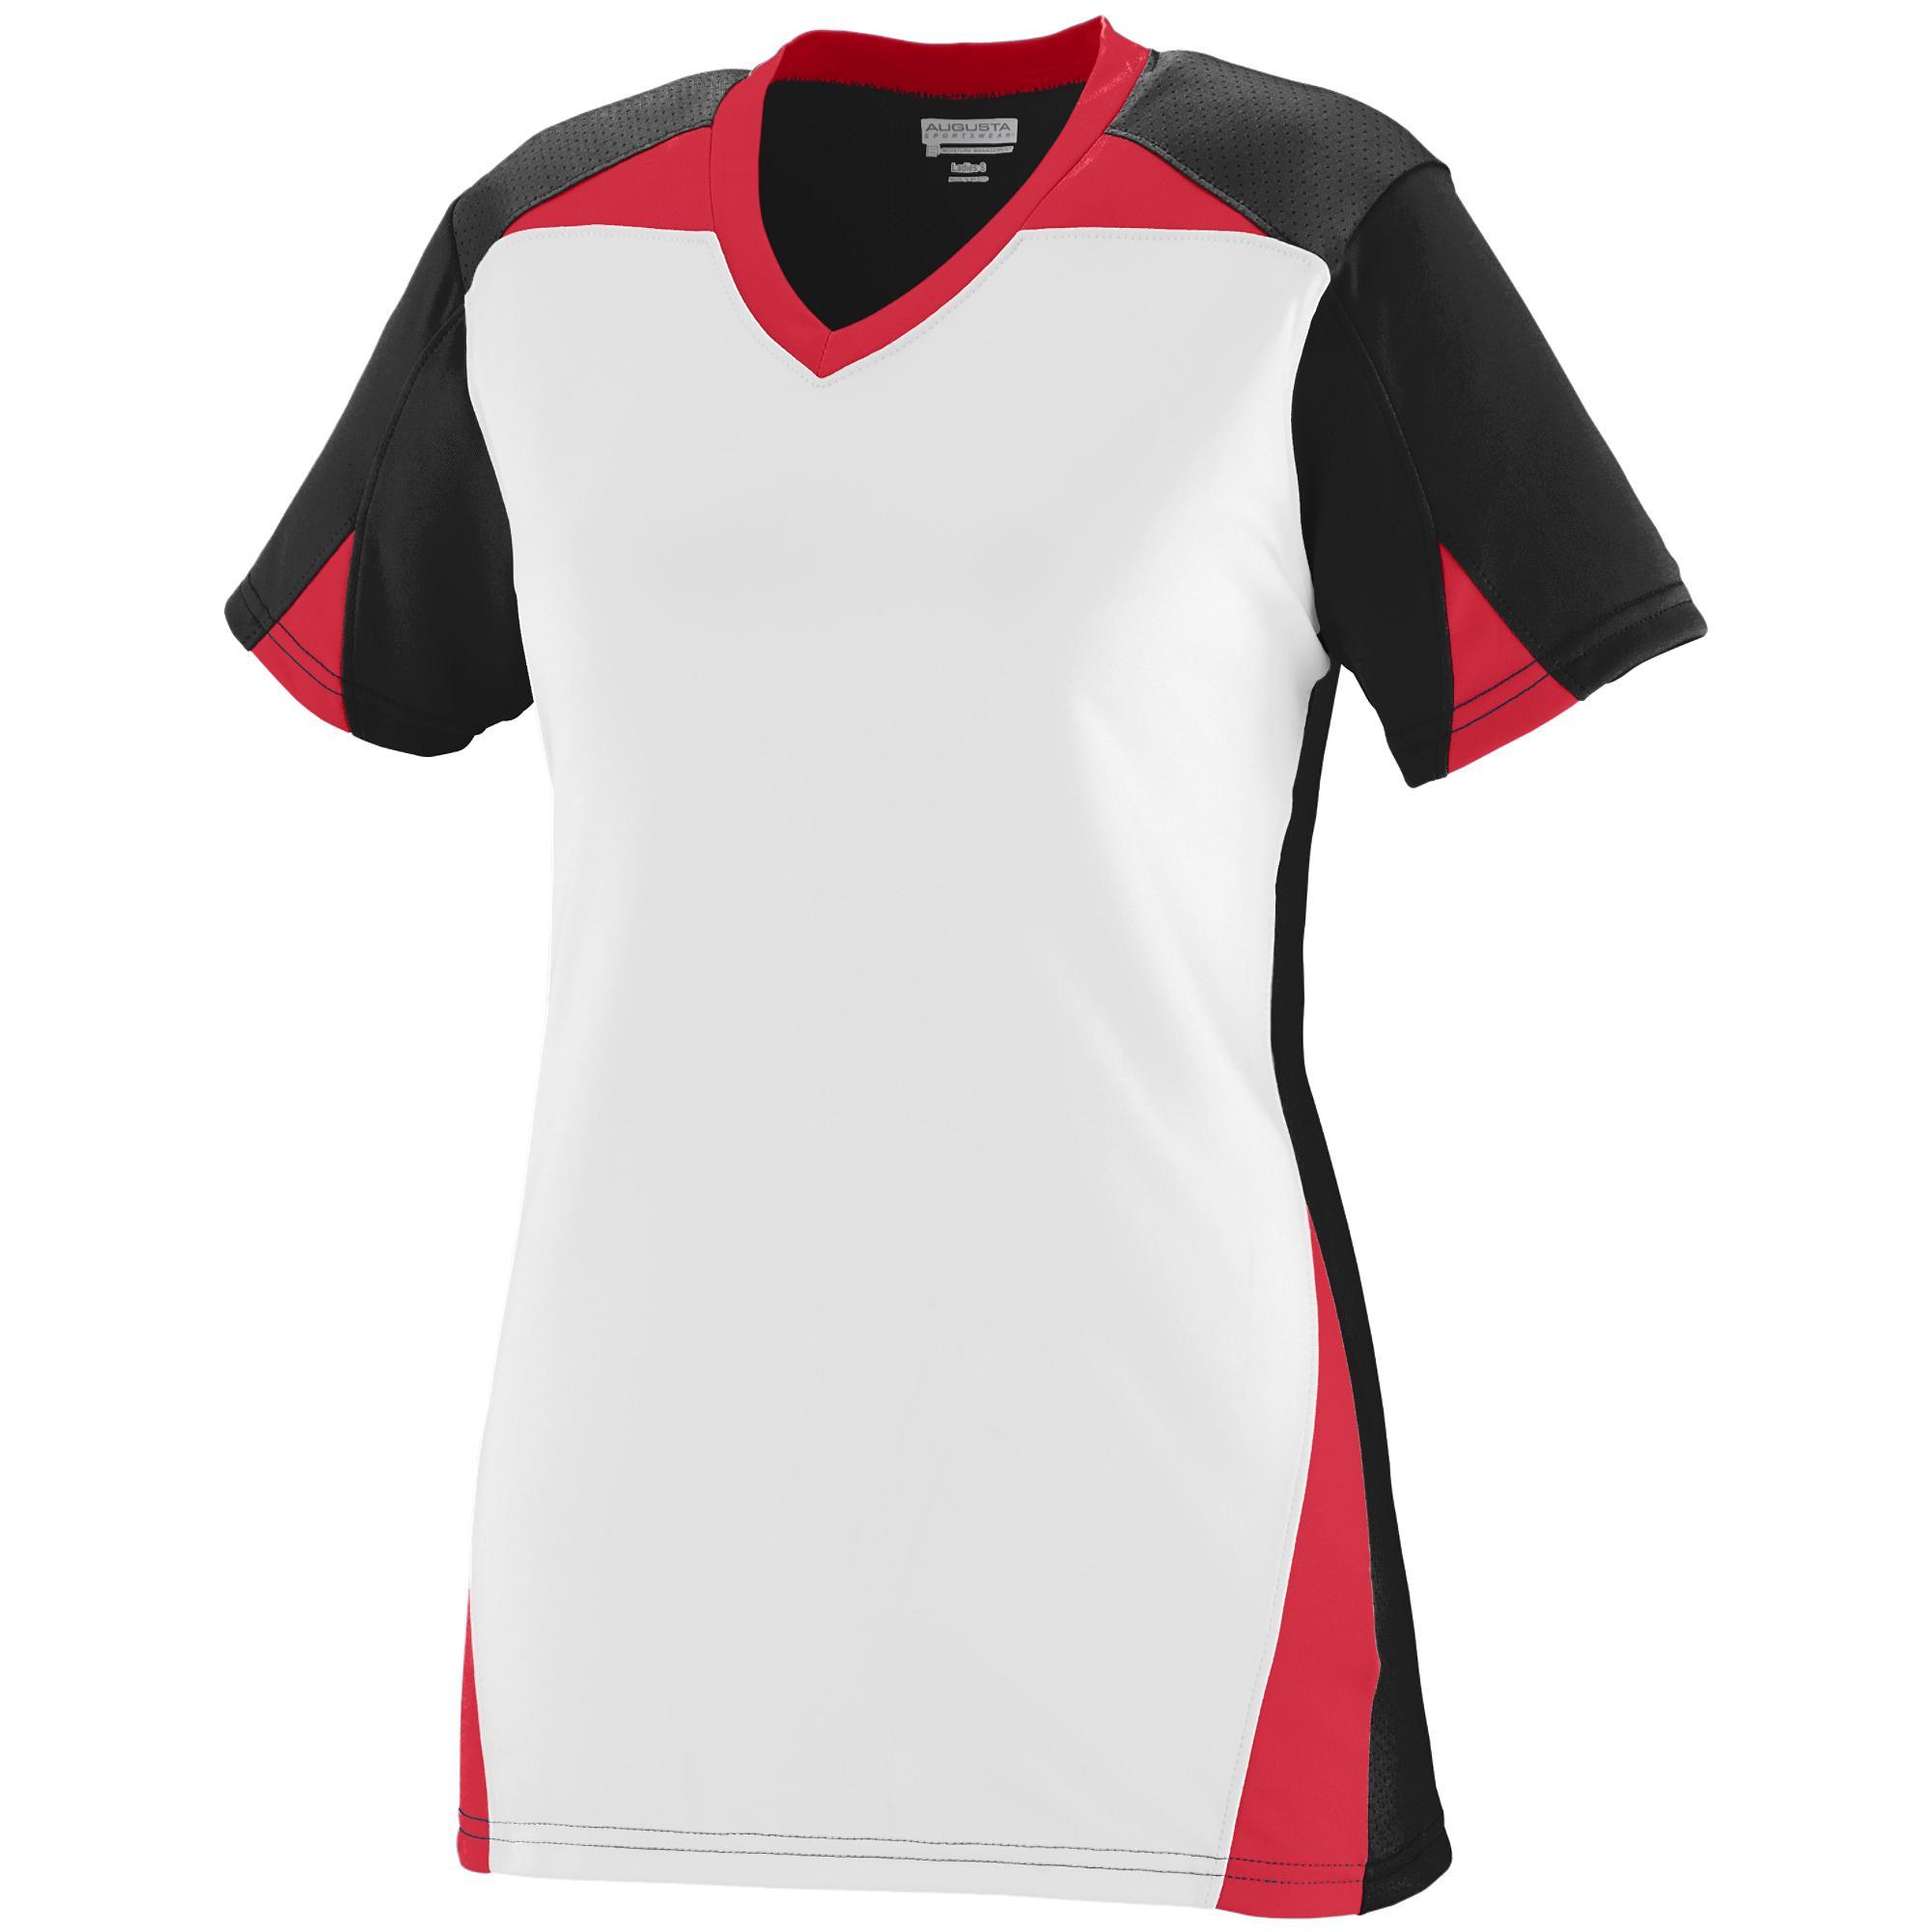 Augusta Sportswear 1366 Teamwear Jersey Matrix Girls